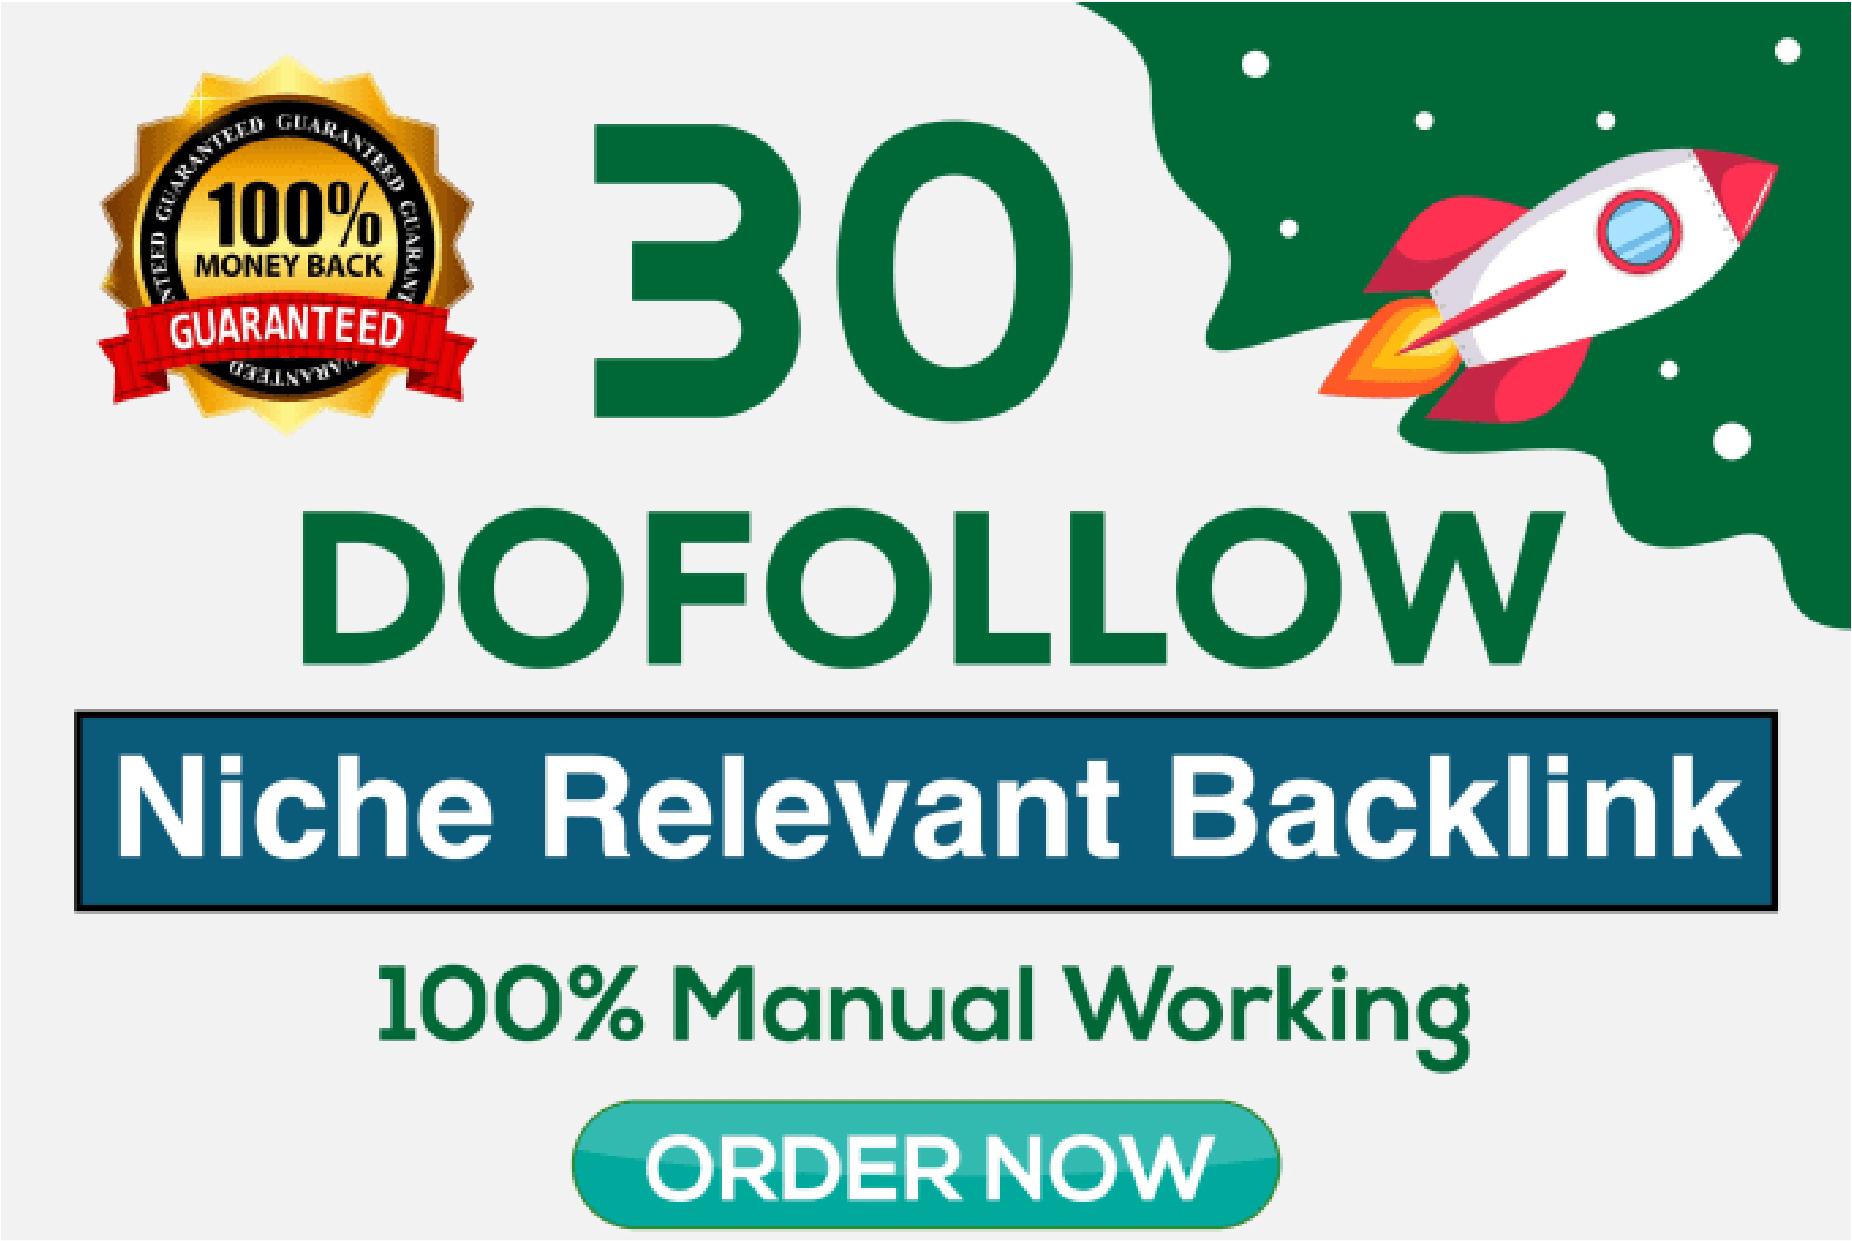 I will Creat 30 Dofollow Niche Relevant Backlinks